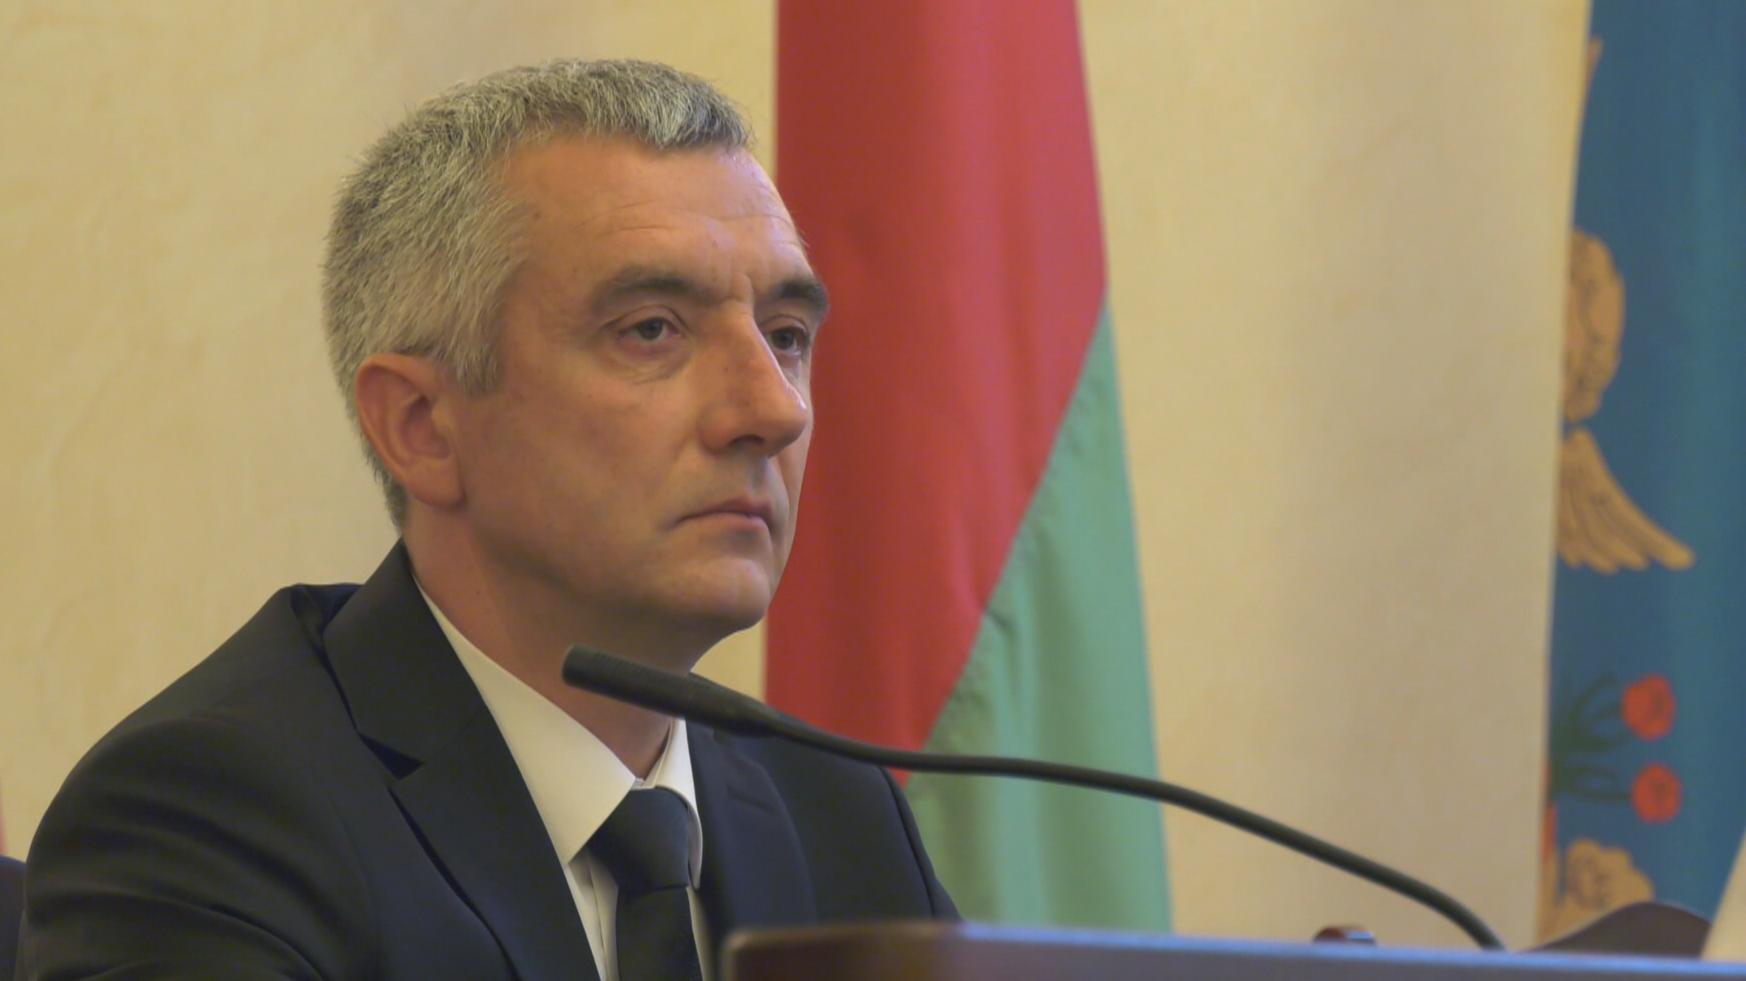 orlov - Председателем Витебского горисполкома стал Николай Орлов (видео)